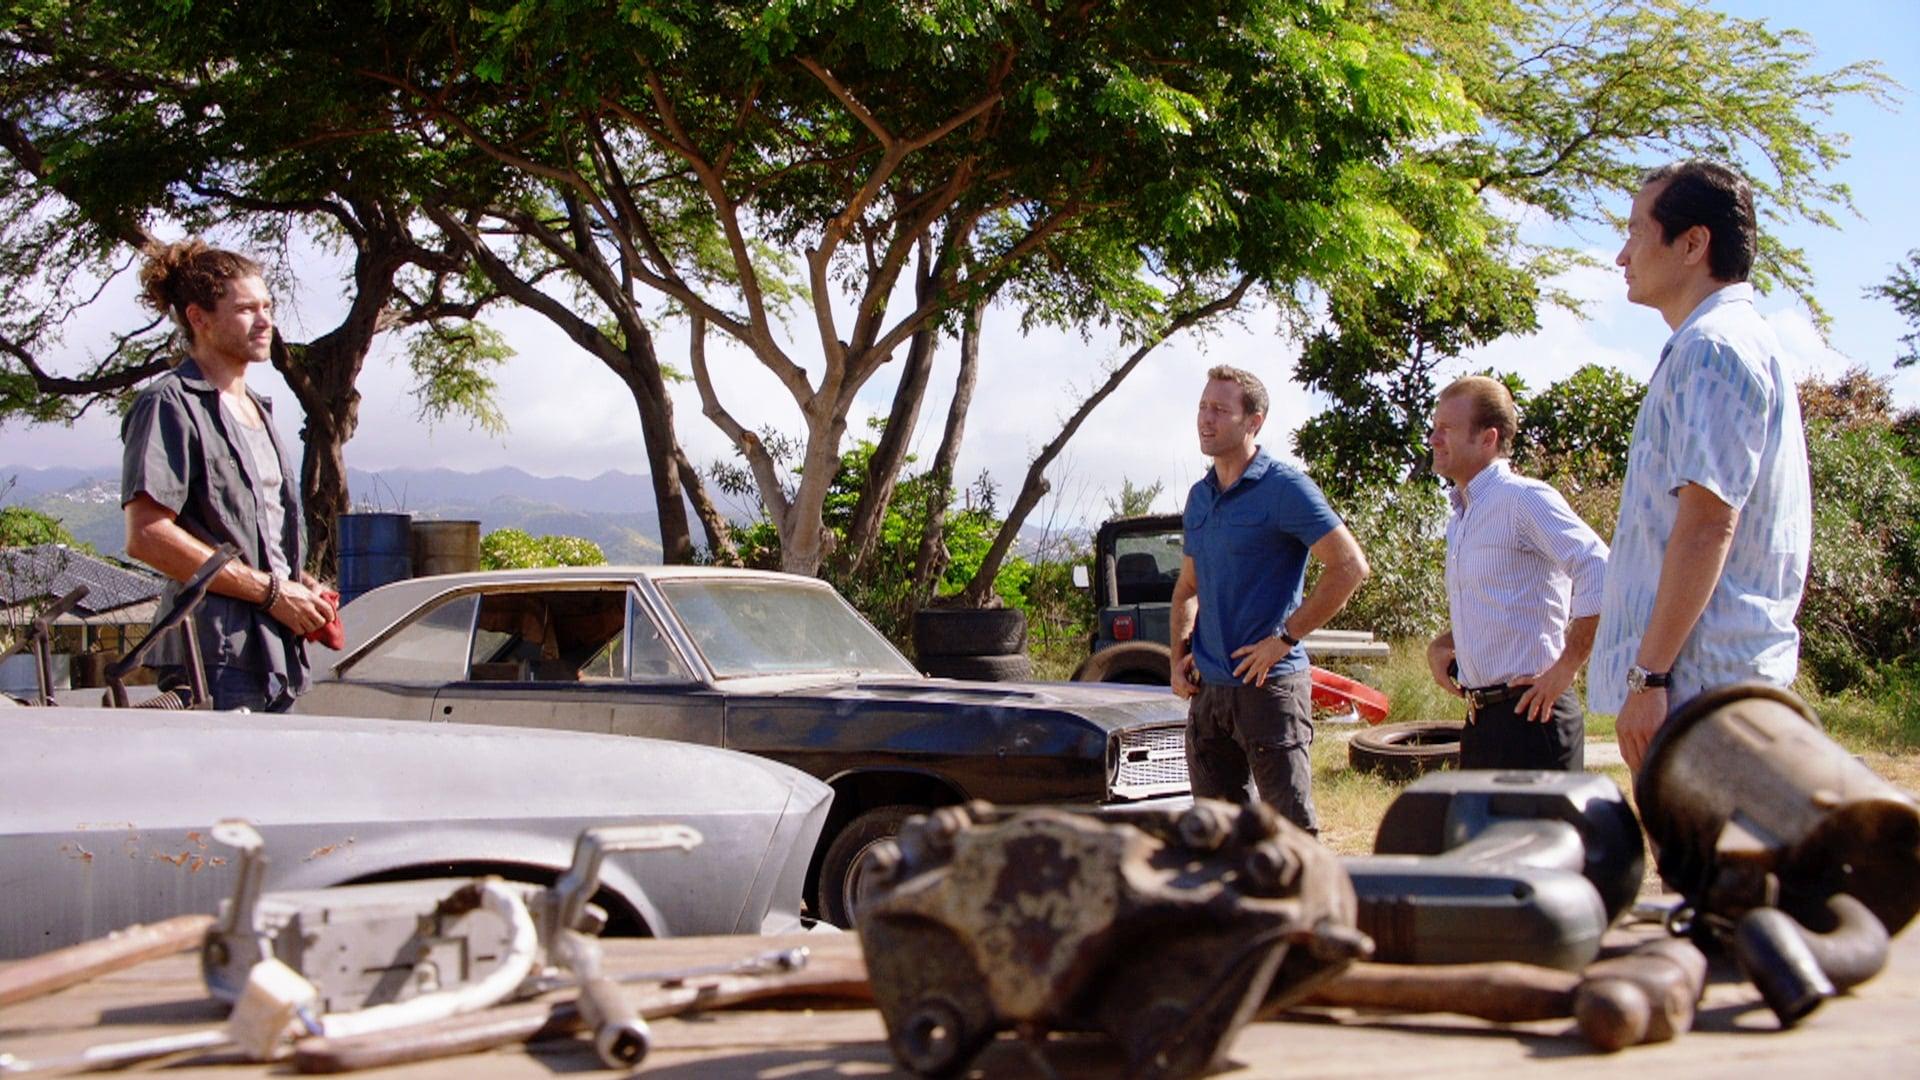 Hawaii Five-0 - Season 7 Episode 10 : Ka Luhi (The Burden)